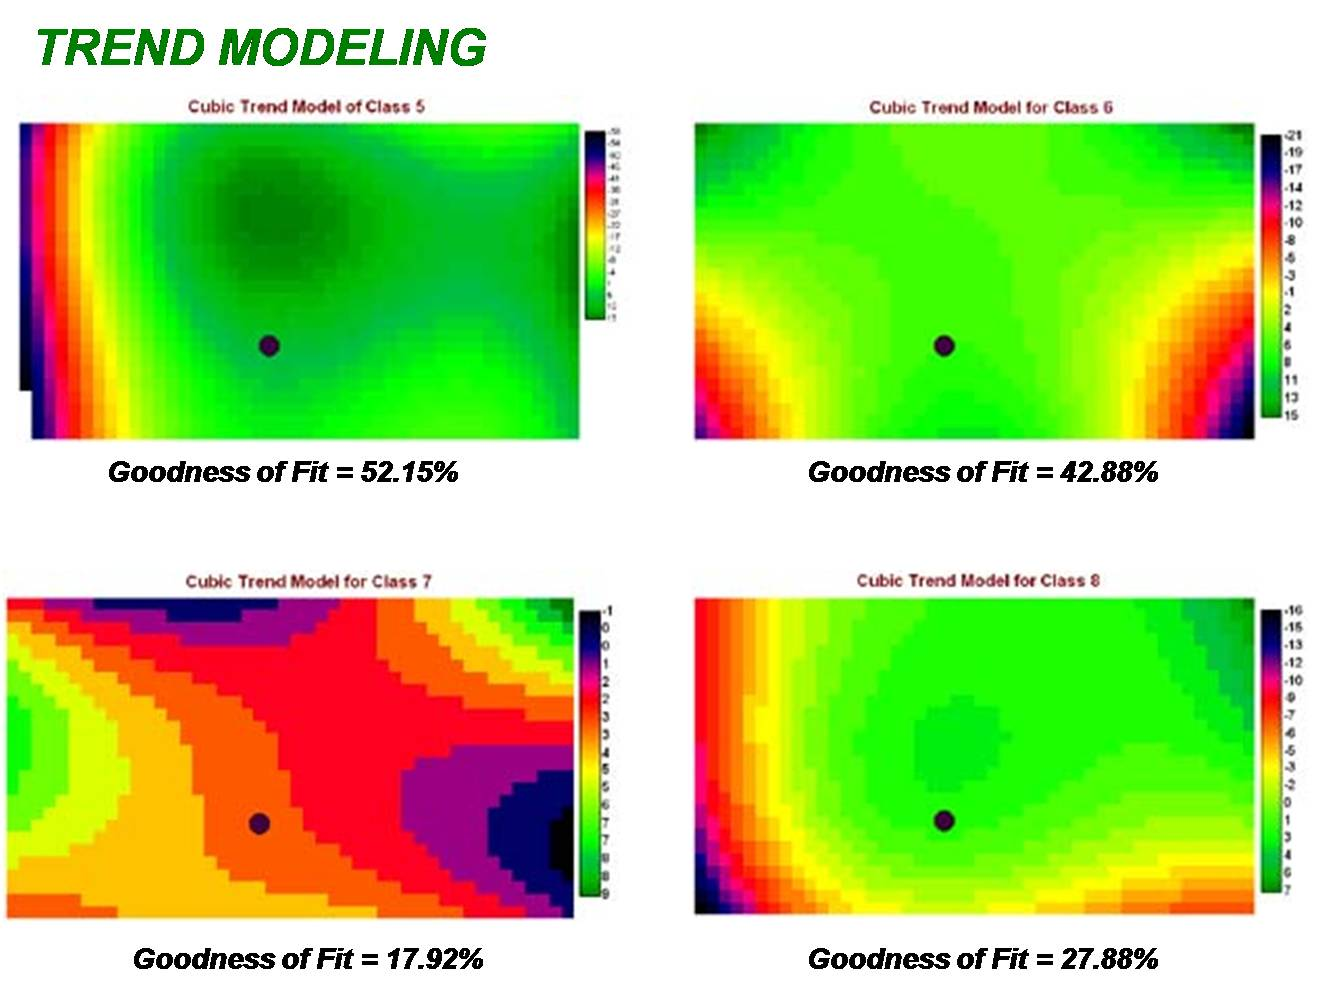 Less Effective Vegetation Surface Models for predicting vector behaviors